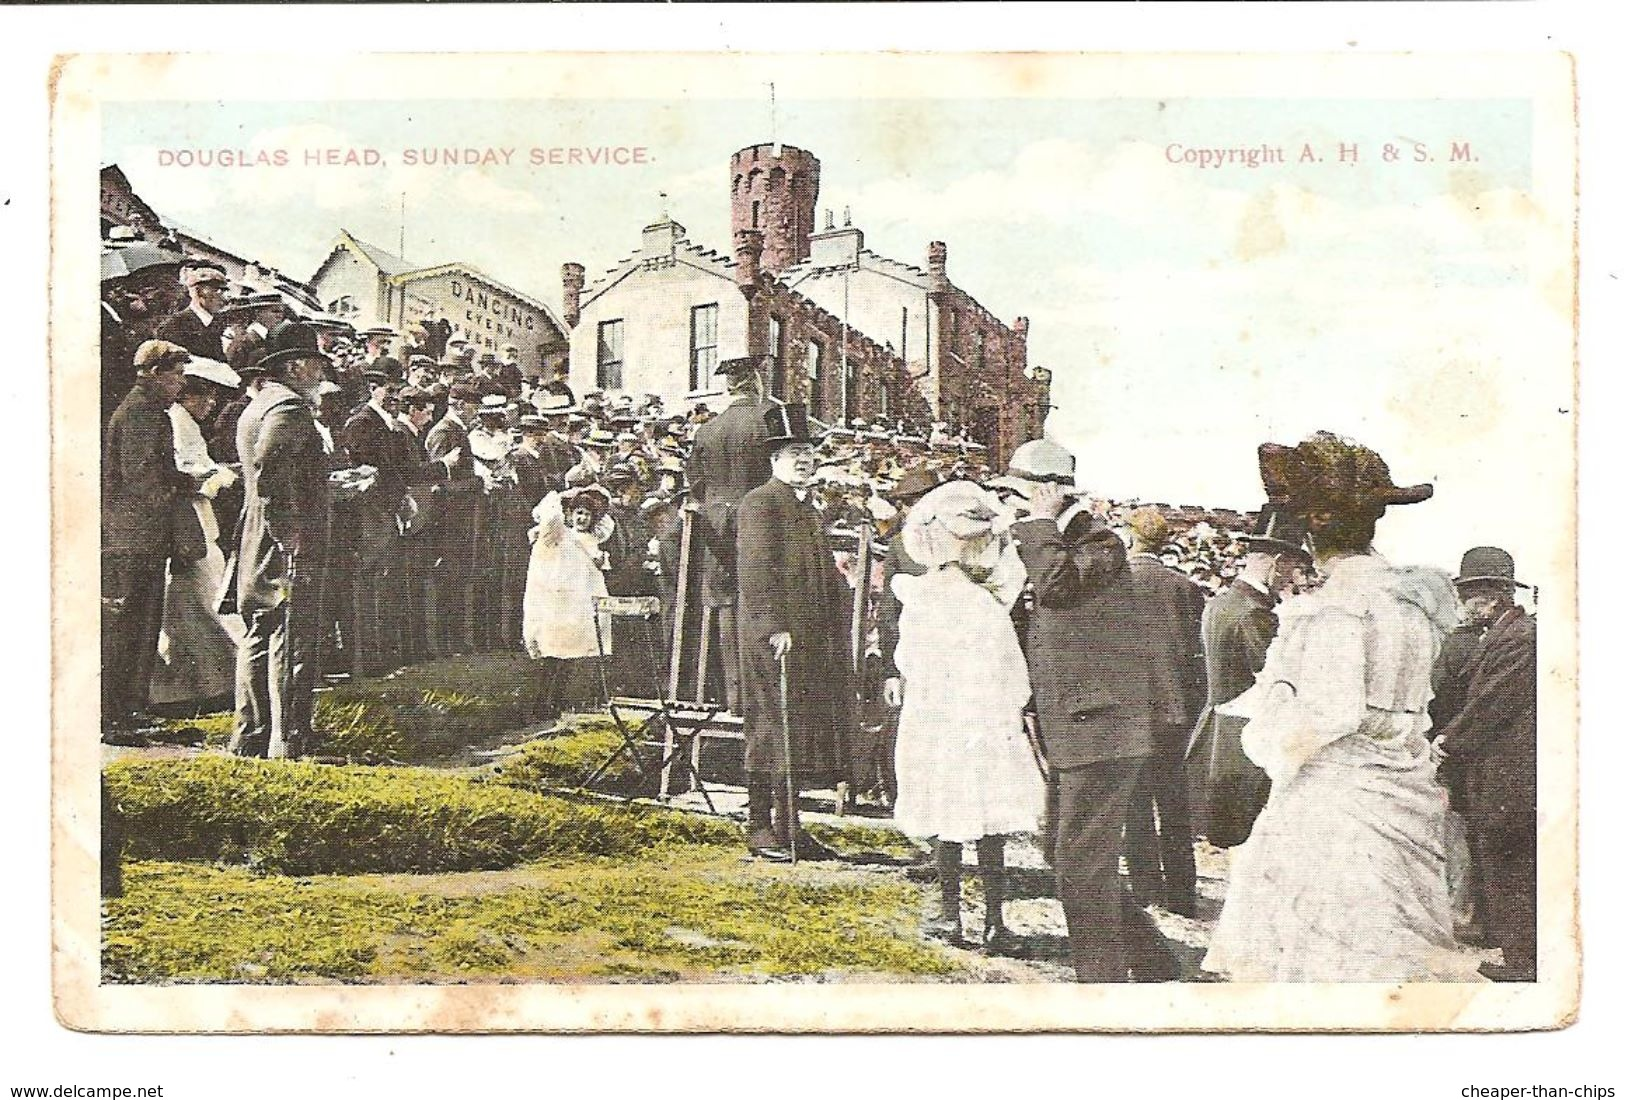 Douglas Head, Sunday Service - A.H. & S.M. - Isle Of Man